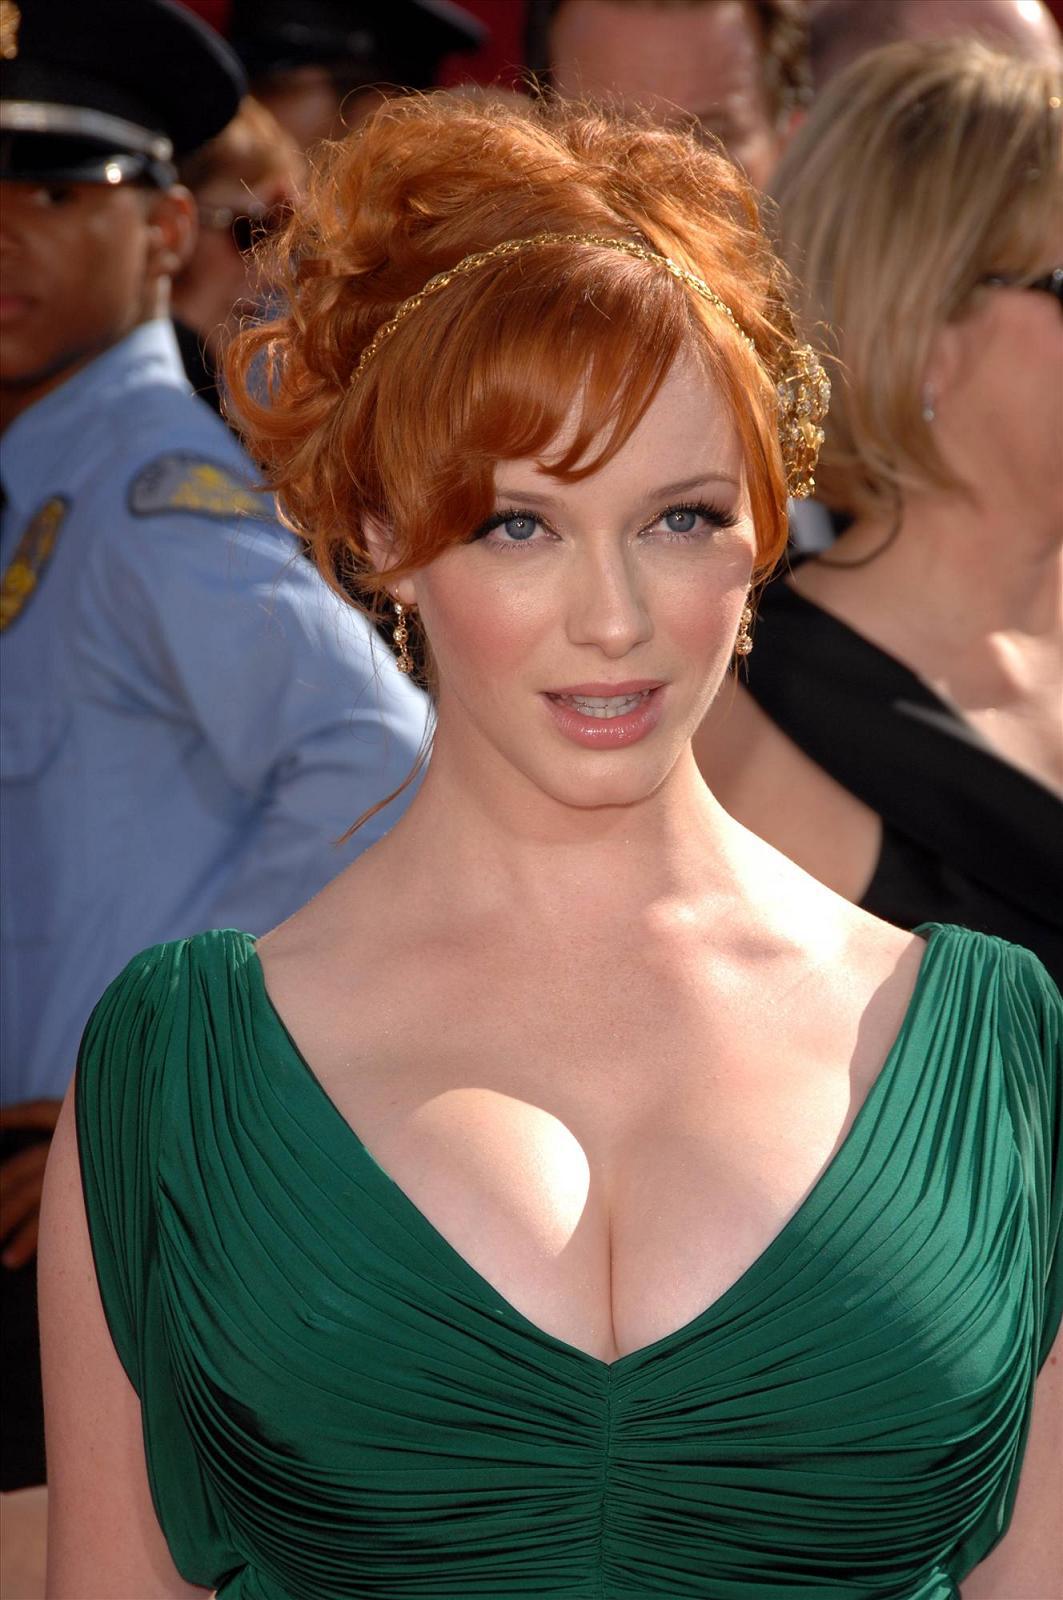 http://4.bp.blogspot.com/-7N_EVcVbOBo/TcCCAiwPIiI/AAAAAAAAGkg/v8drLRcpIvs/s1600/Christina43b.JPG